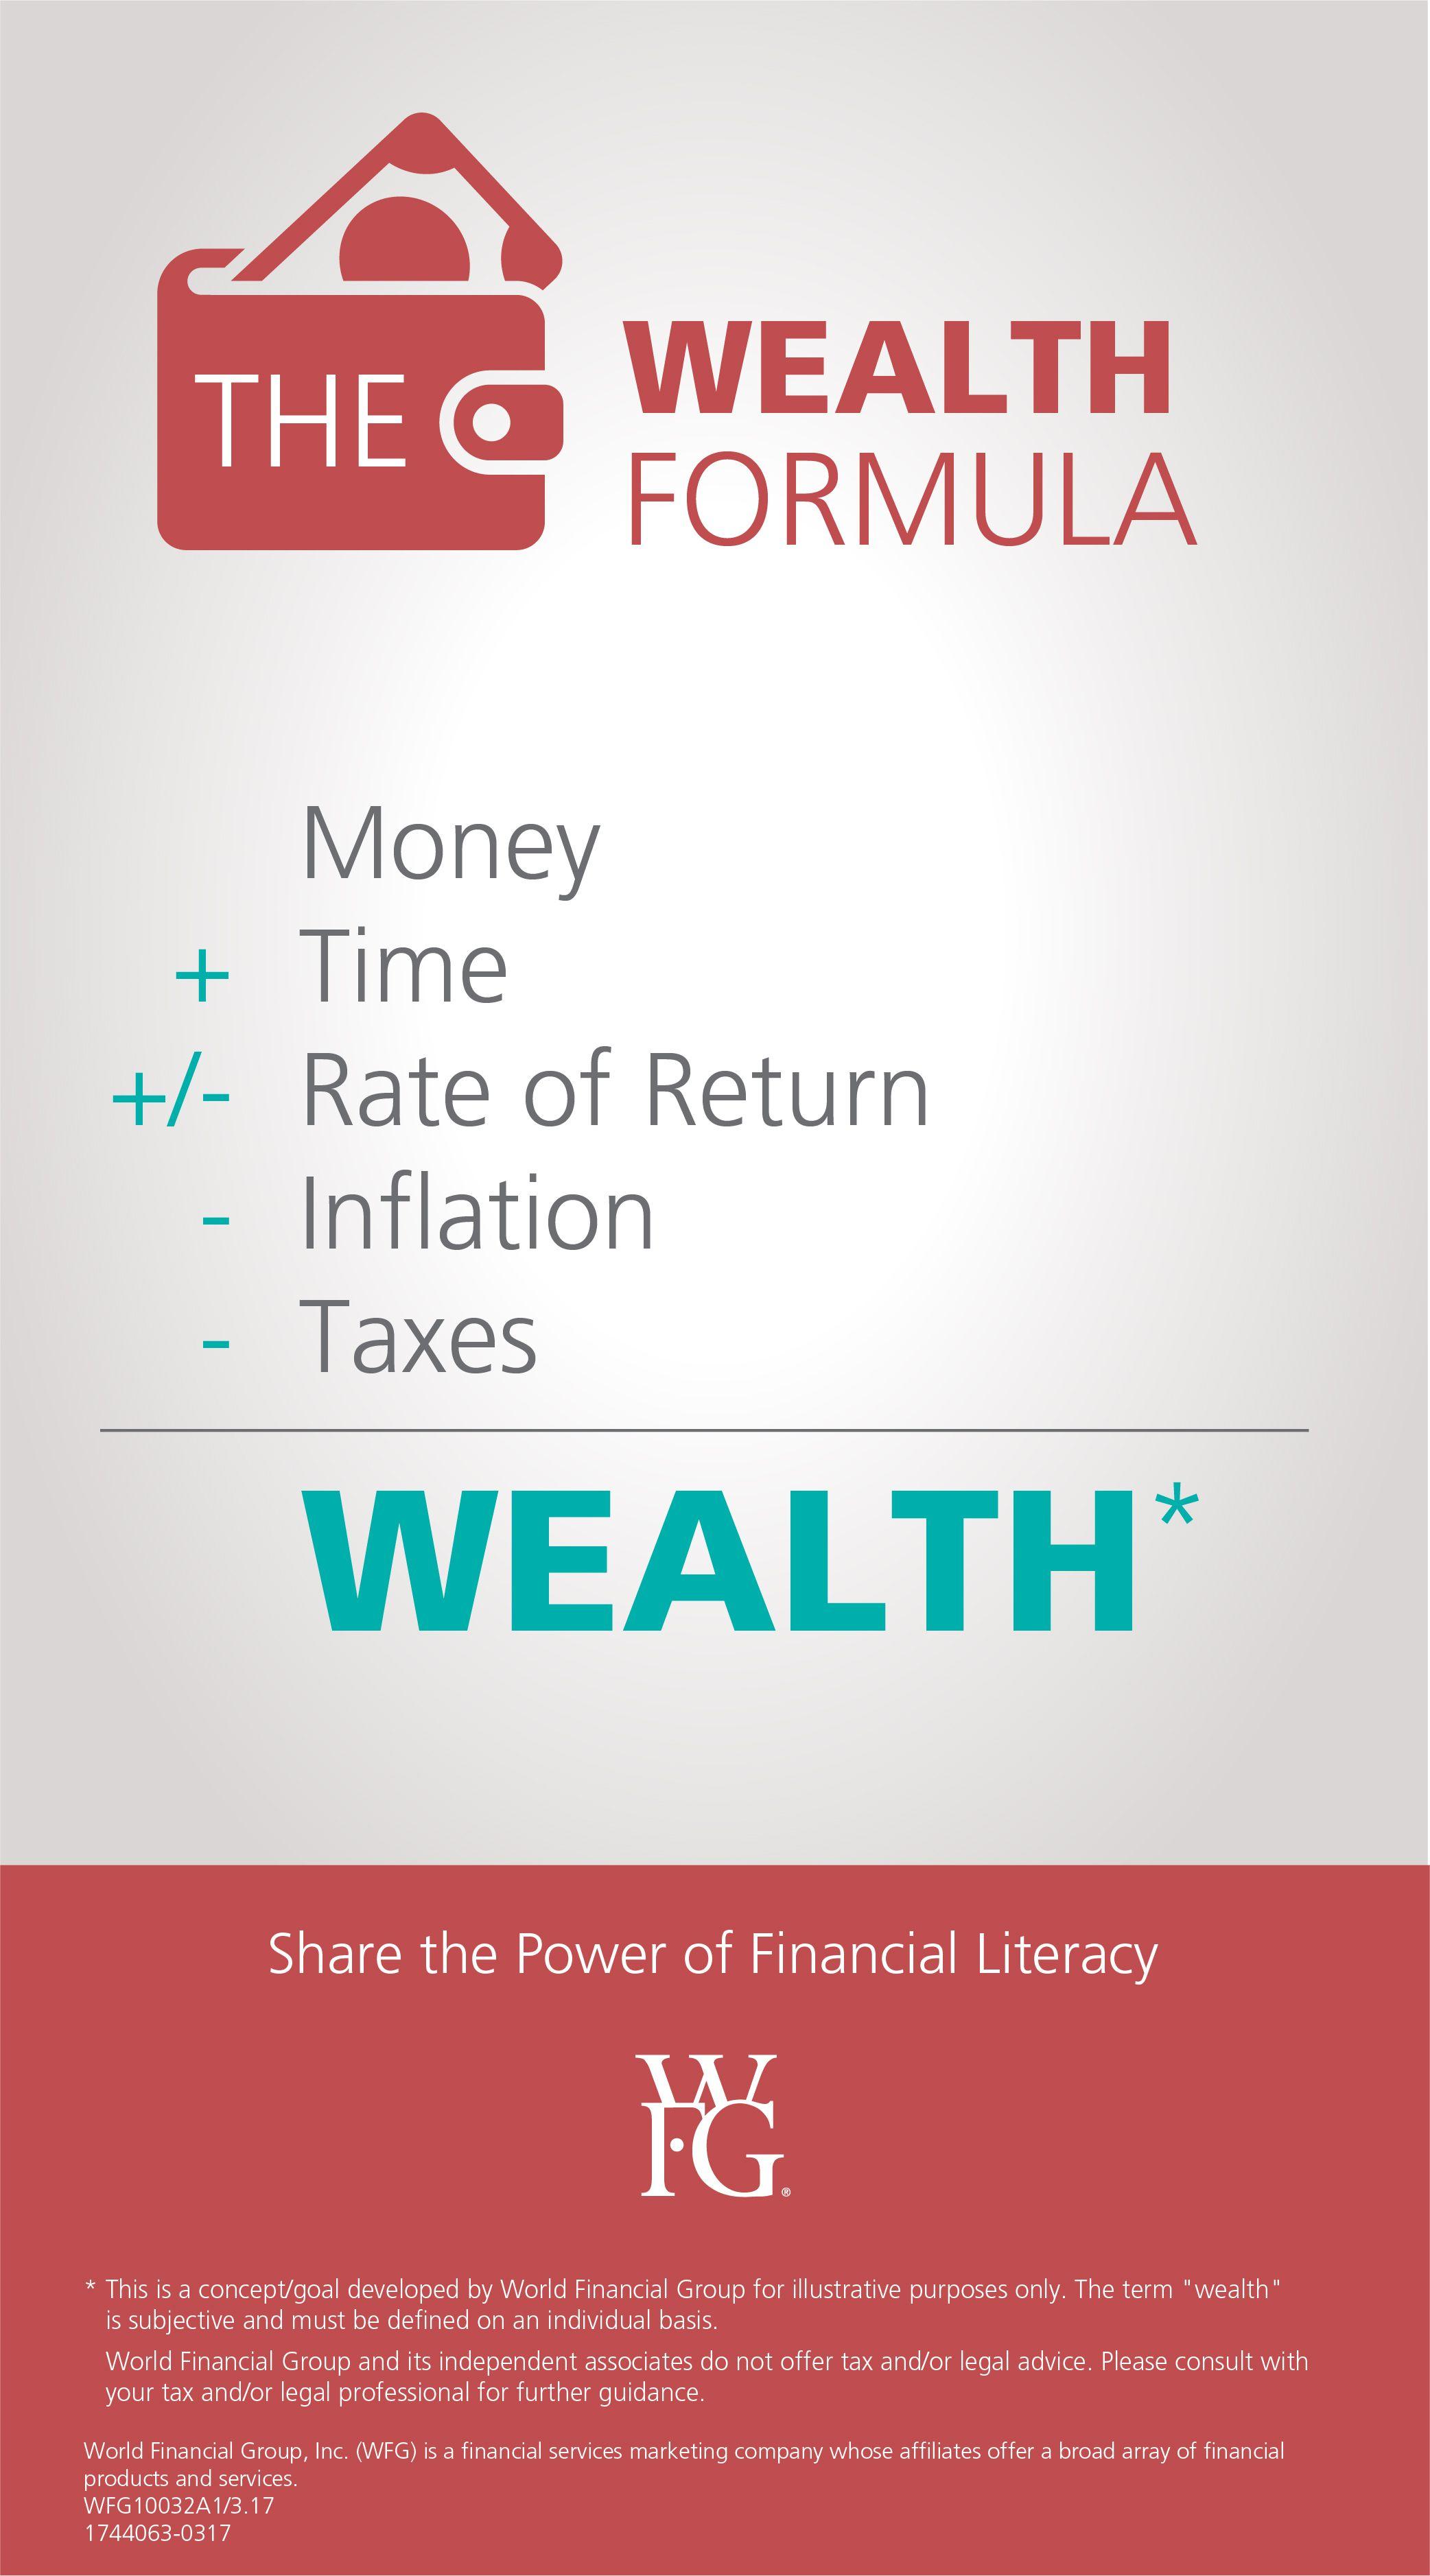 Wfg10032a 3 17 Financial Literacy Month 01 Jpg 2084 3755